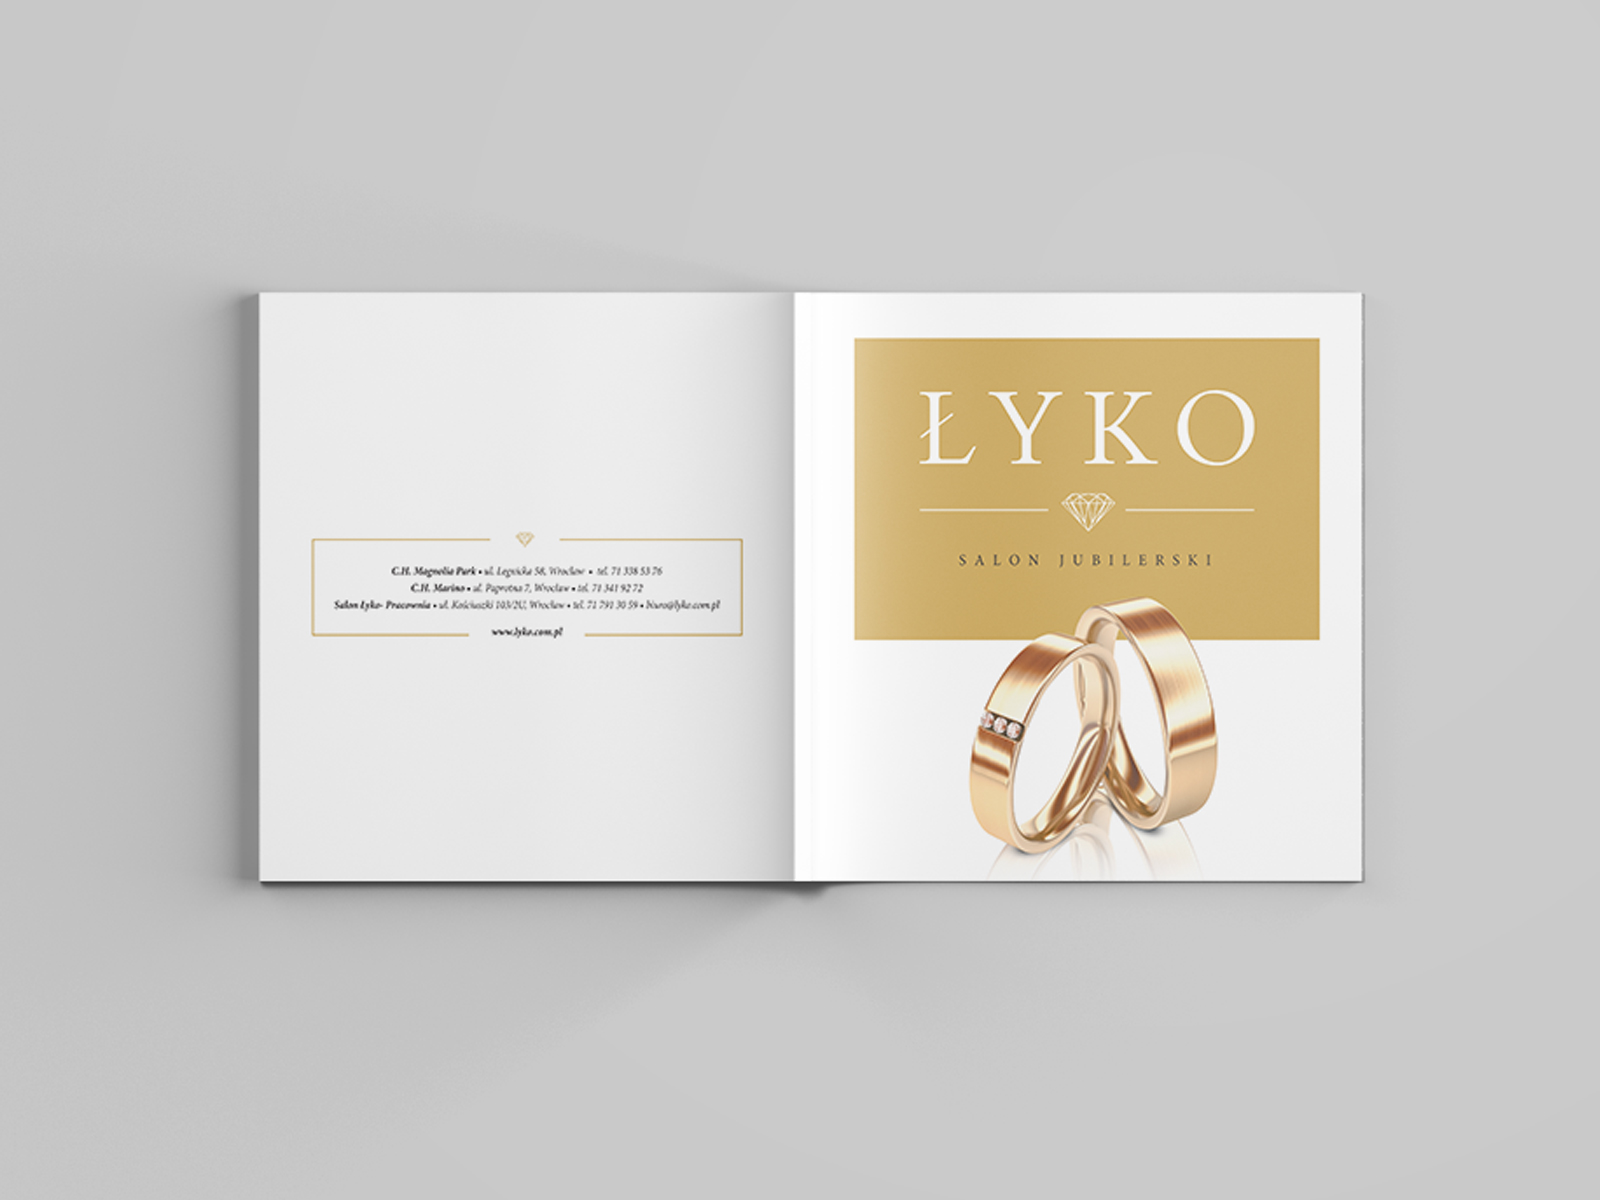 lyko_all10